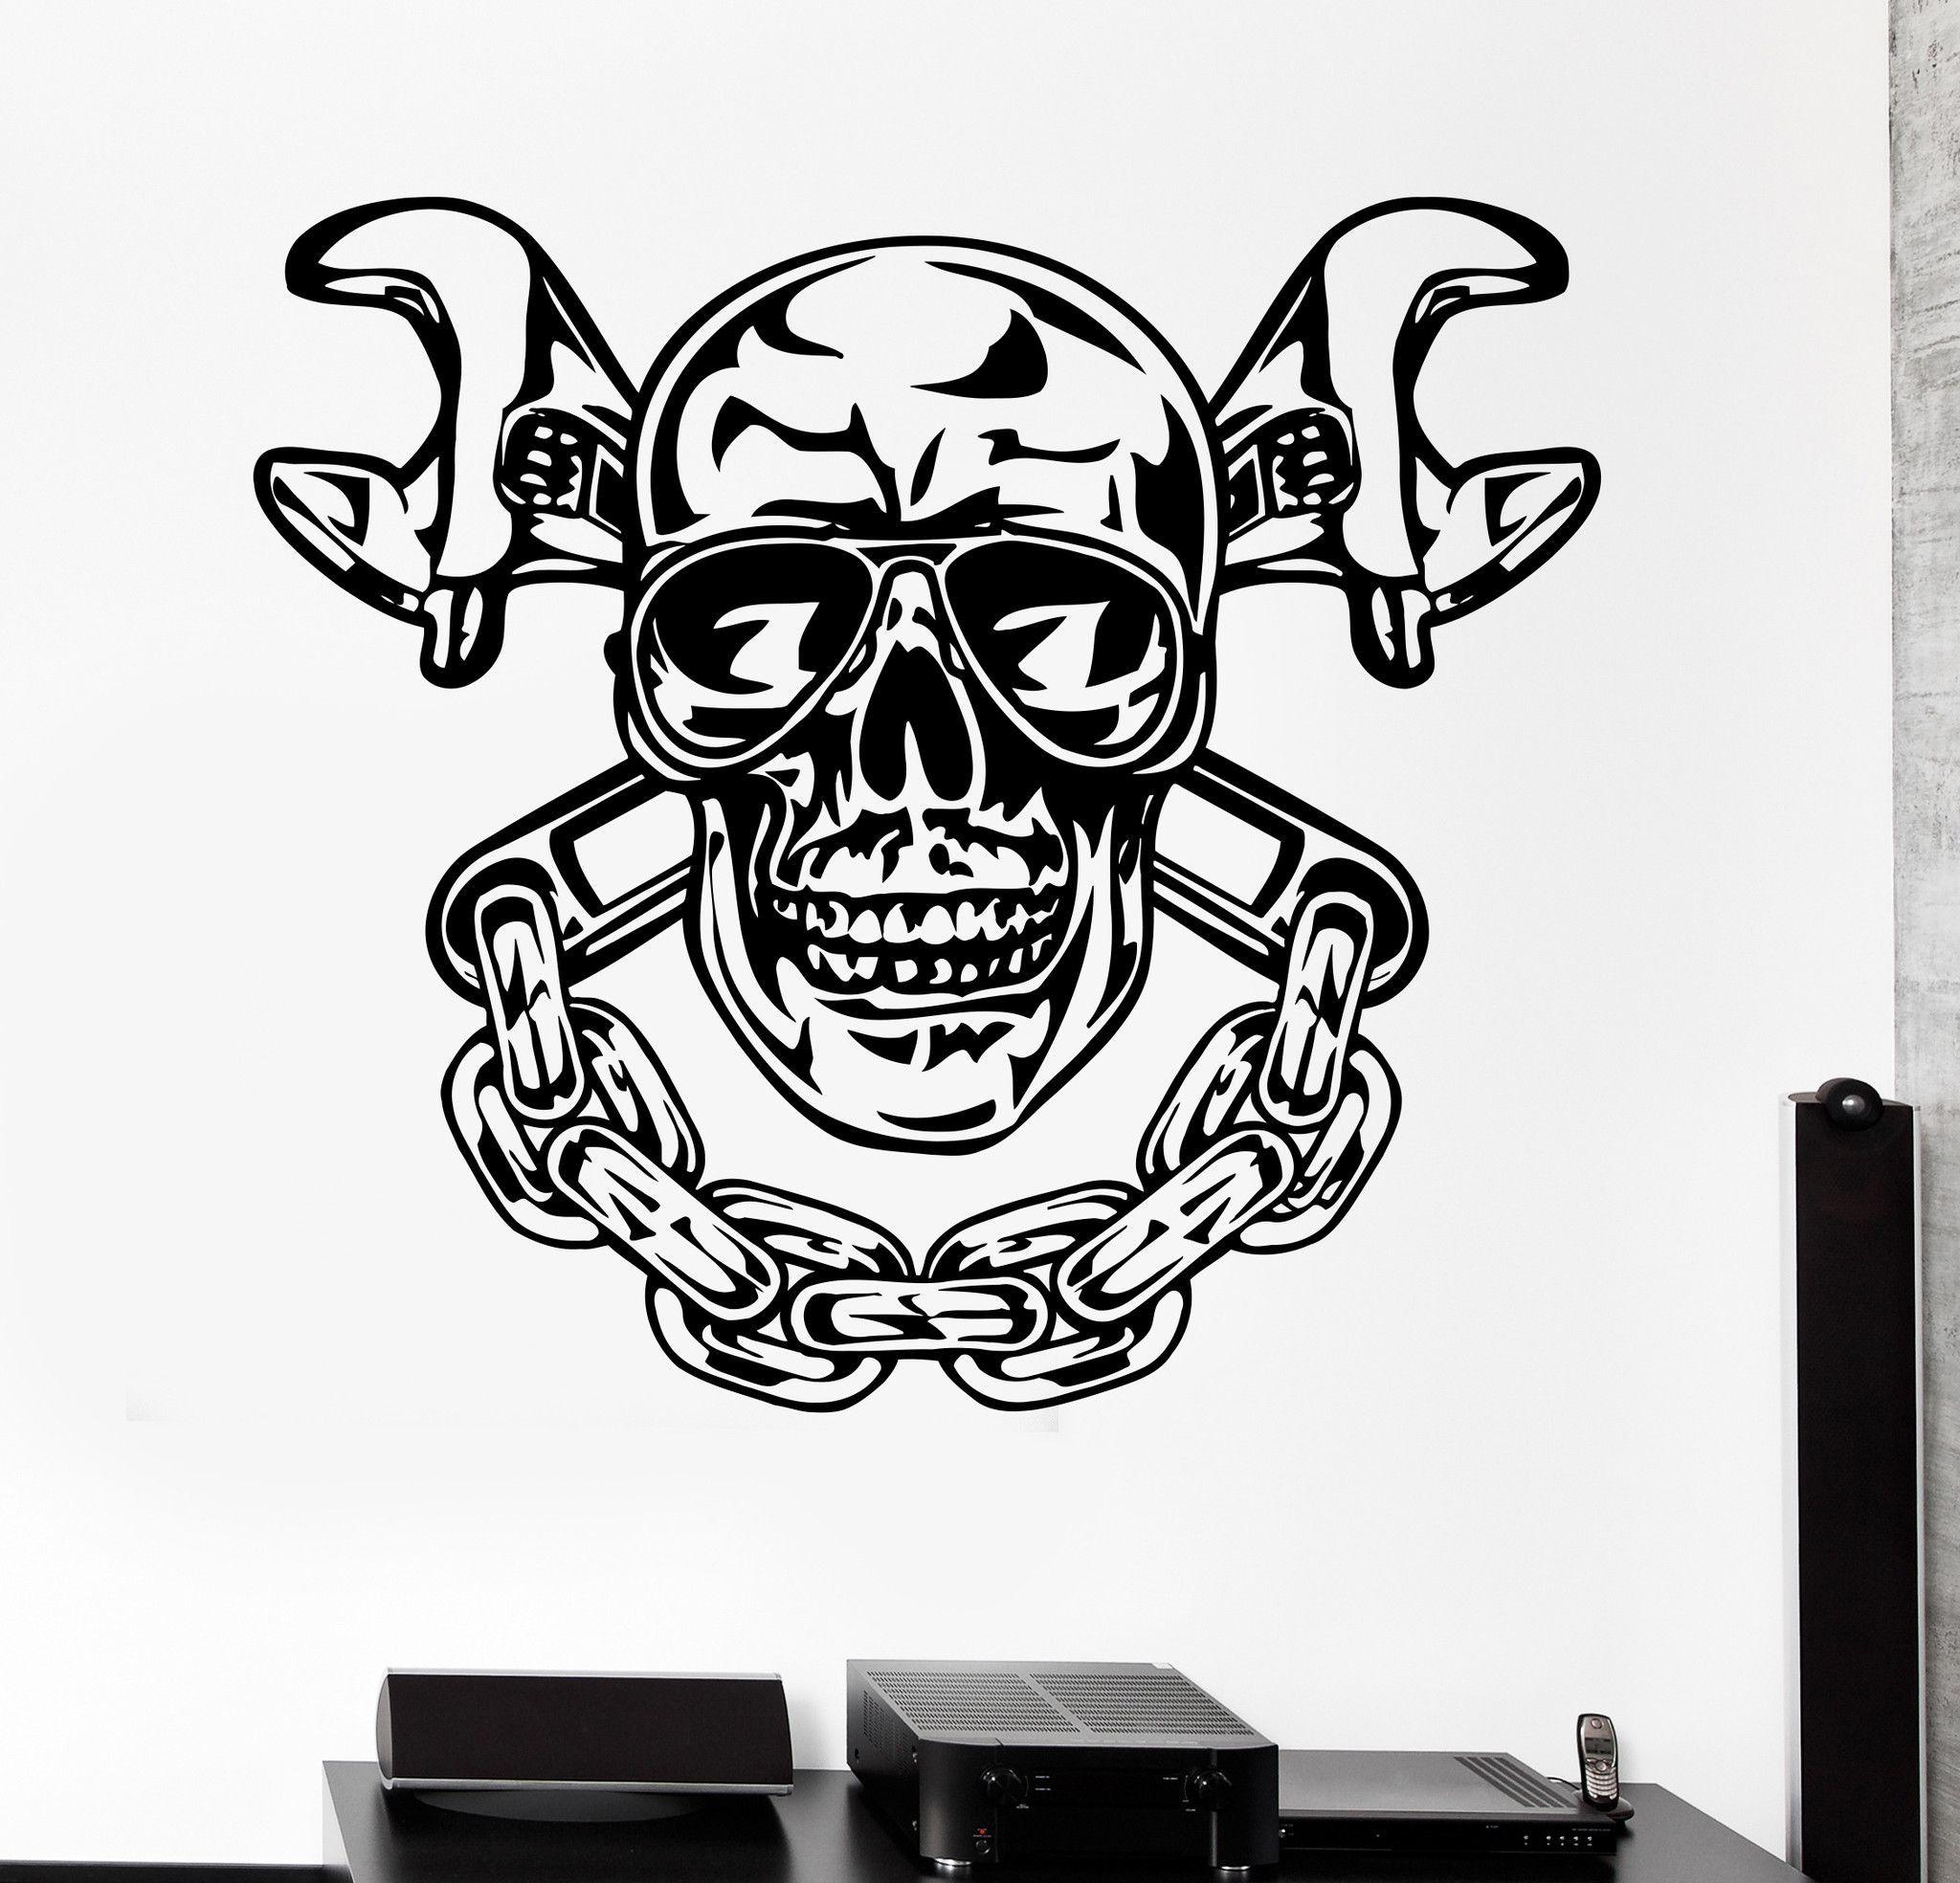 Vinyl Wall Decal Skull Chain Auto Car Repair Service Garage - Custom vinyl wall decals for garage